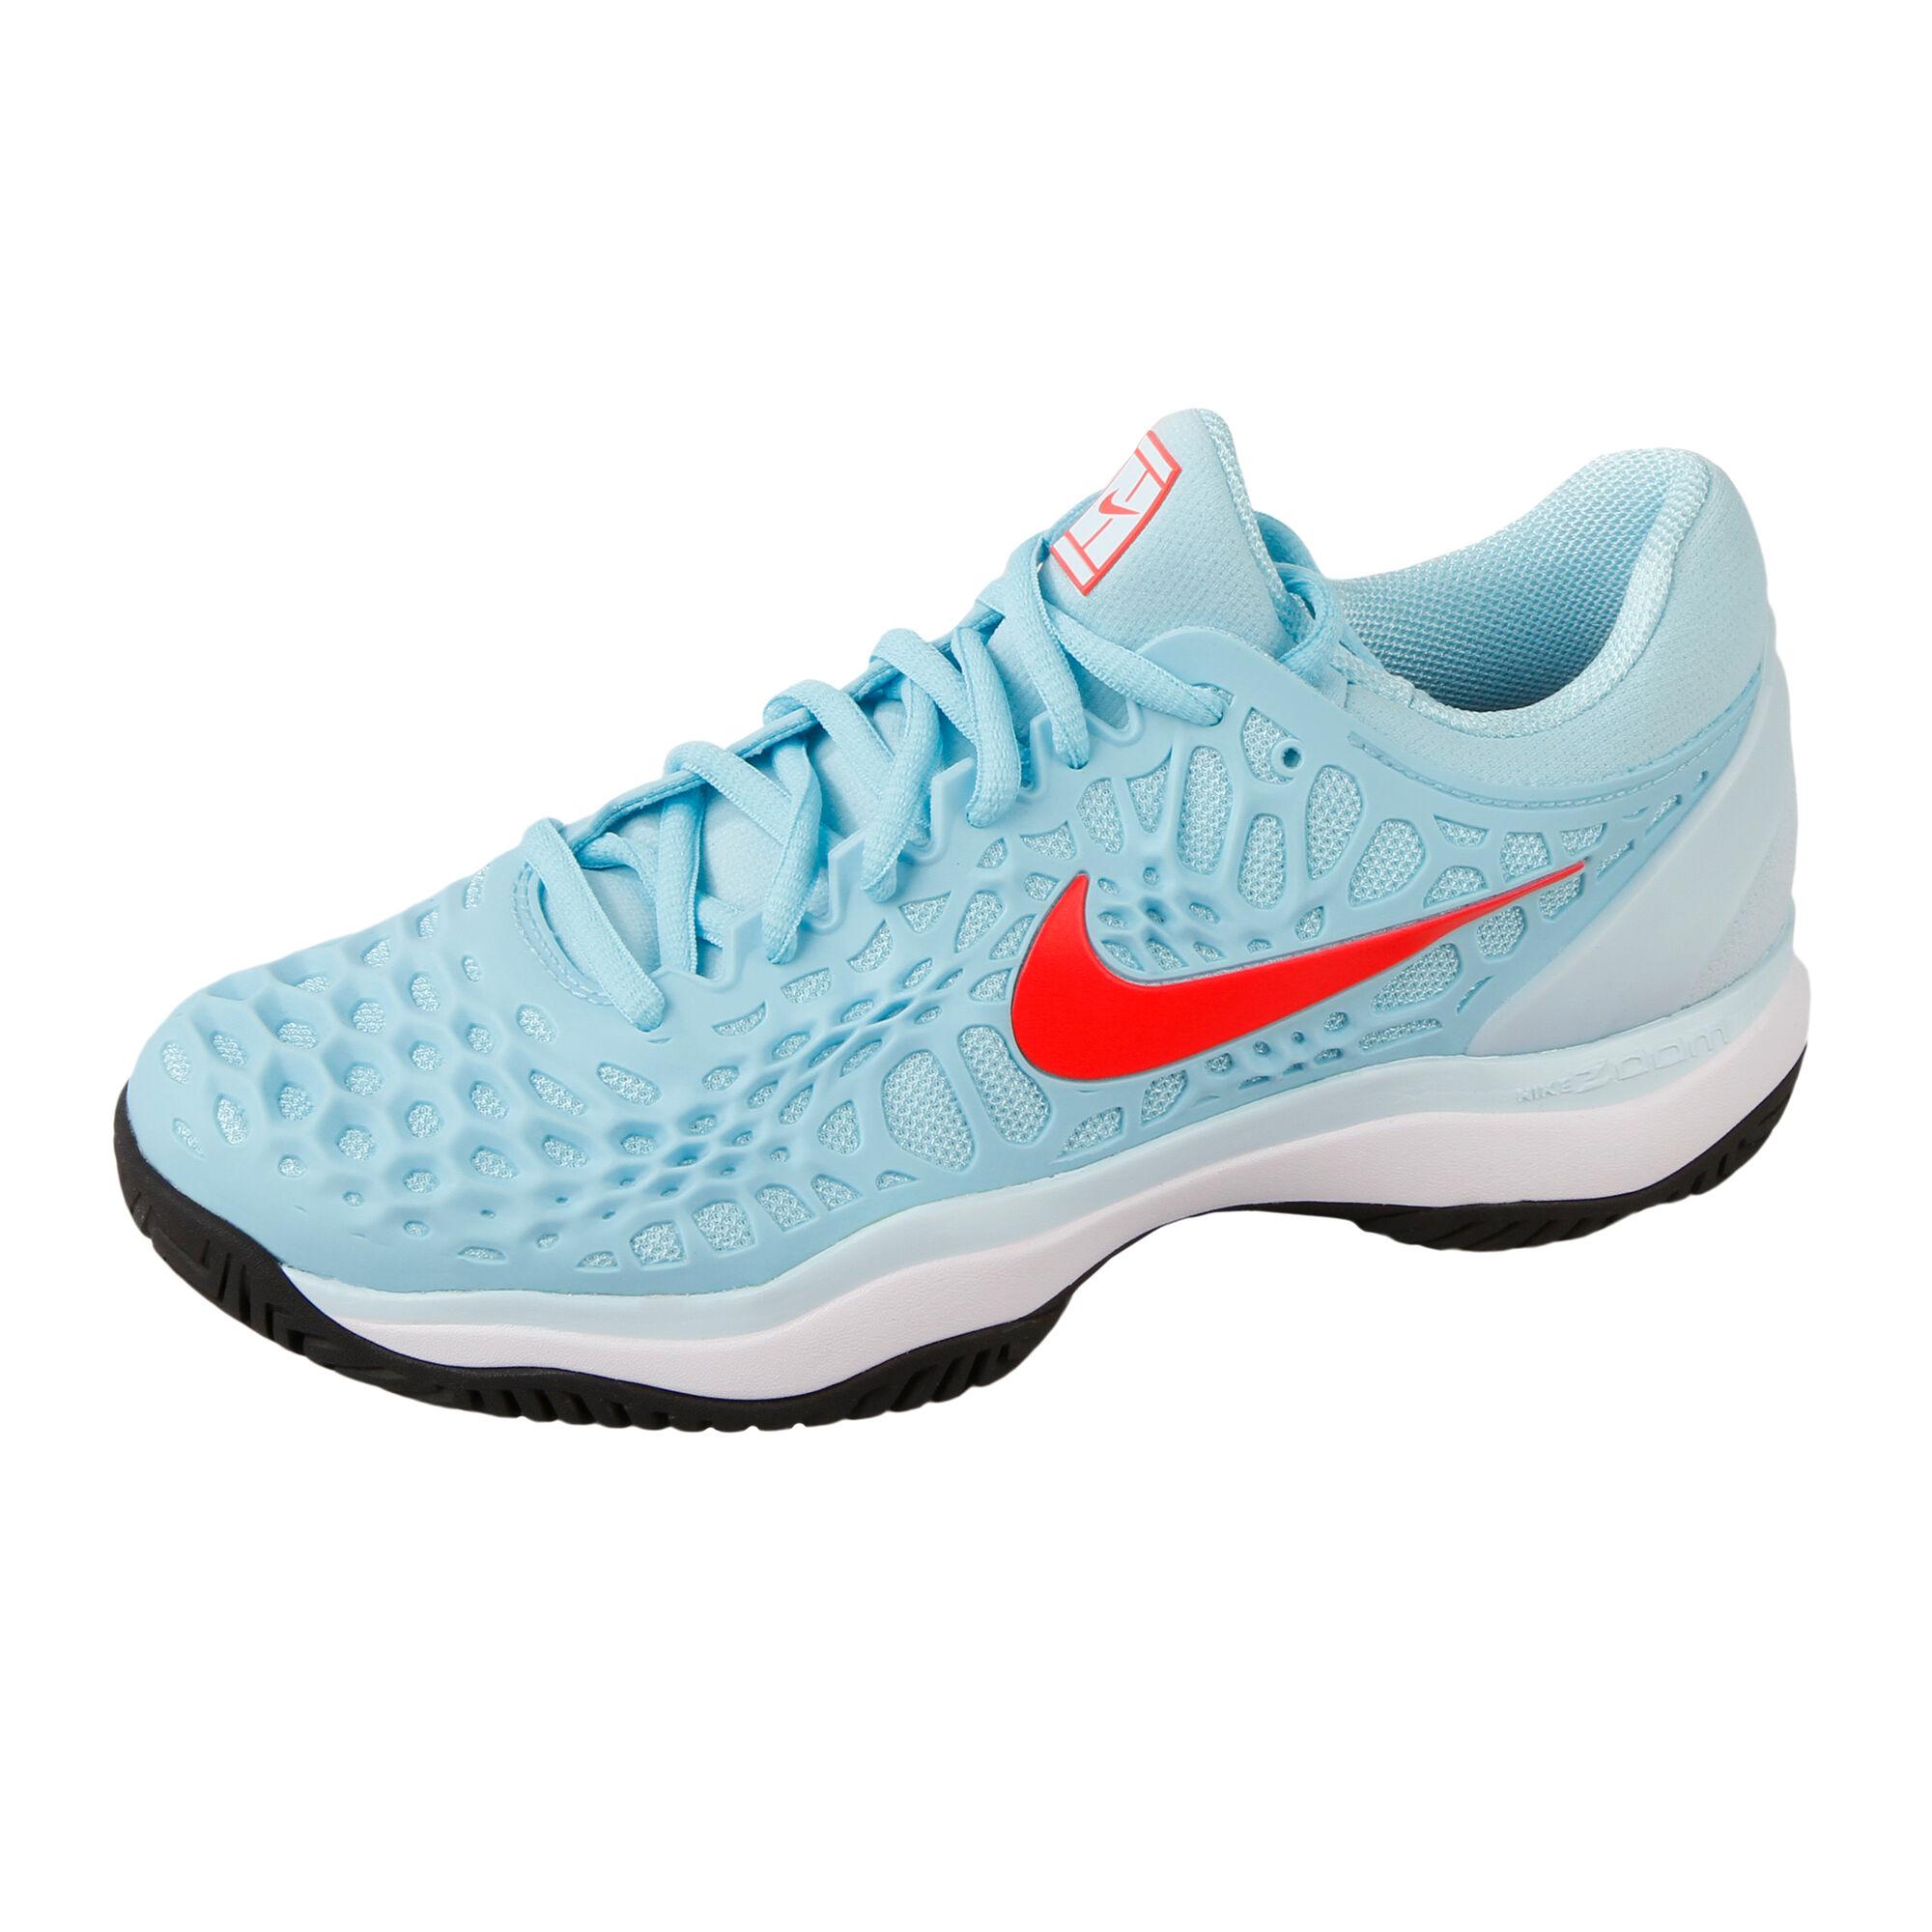 designer fashion 15b57 194de Nike · Nike · Nike · Nike · Nike · Nike · Nike · Nike · Nike. Zoom Cage 3  ...